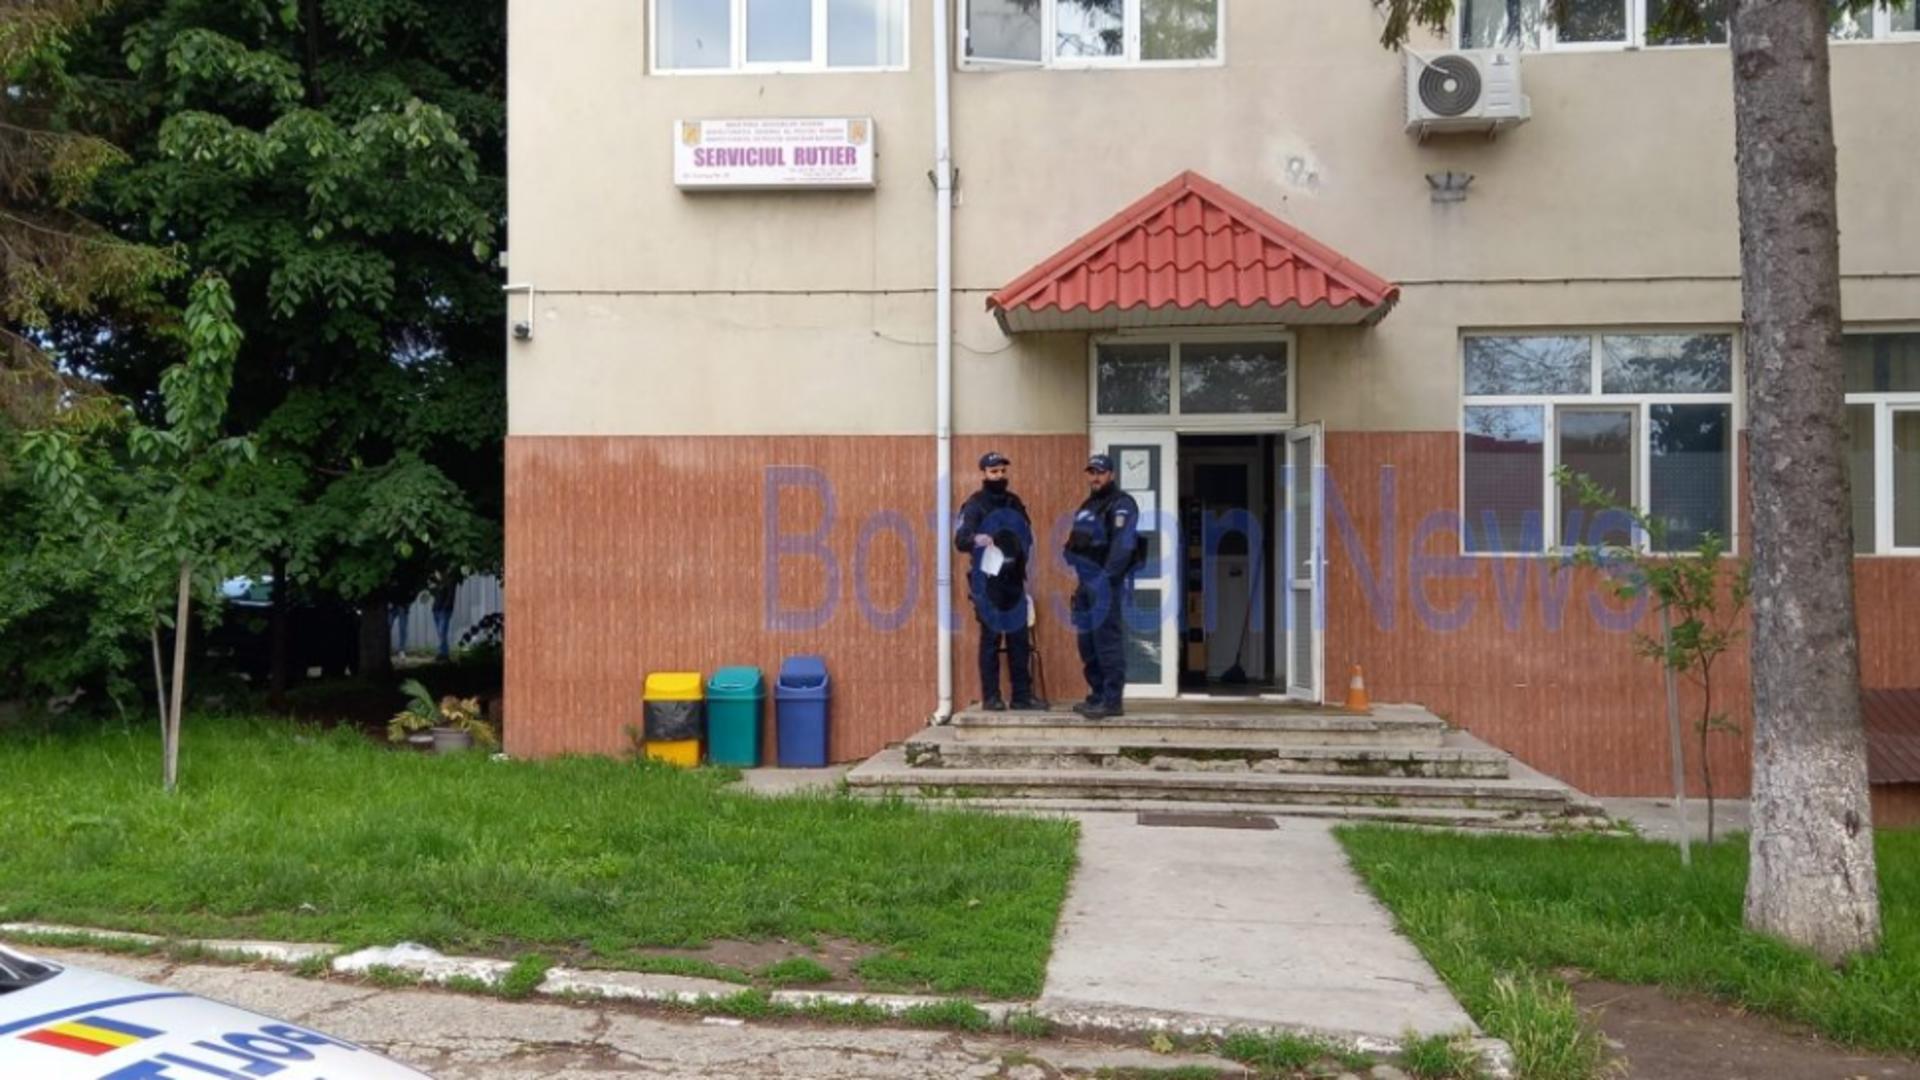 Politia Rutiera Botosani